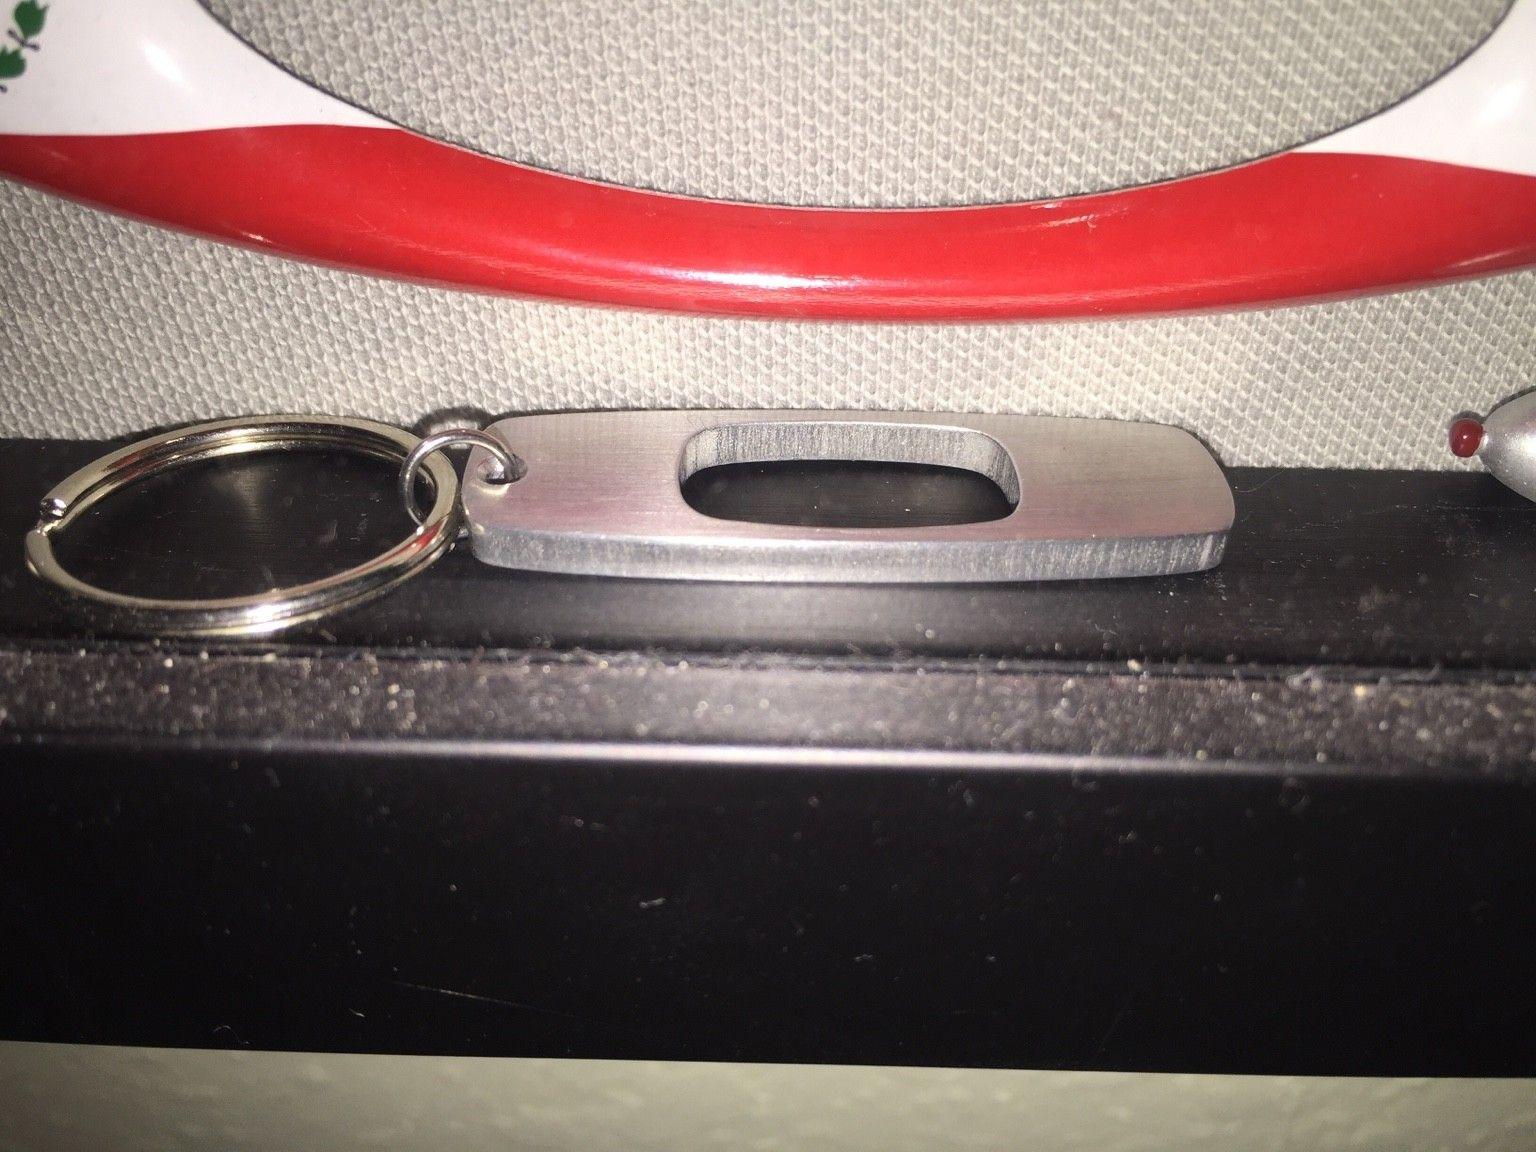 Oakley CUBE case - ImageUploadedByTapatalk1445908522.128367.jpg